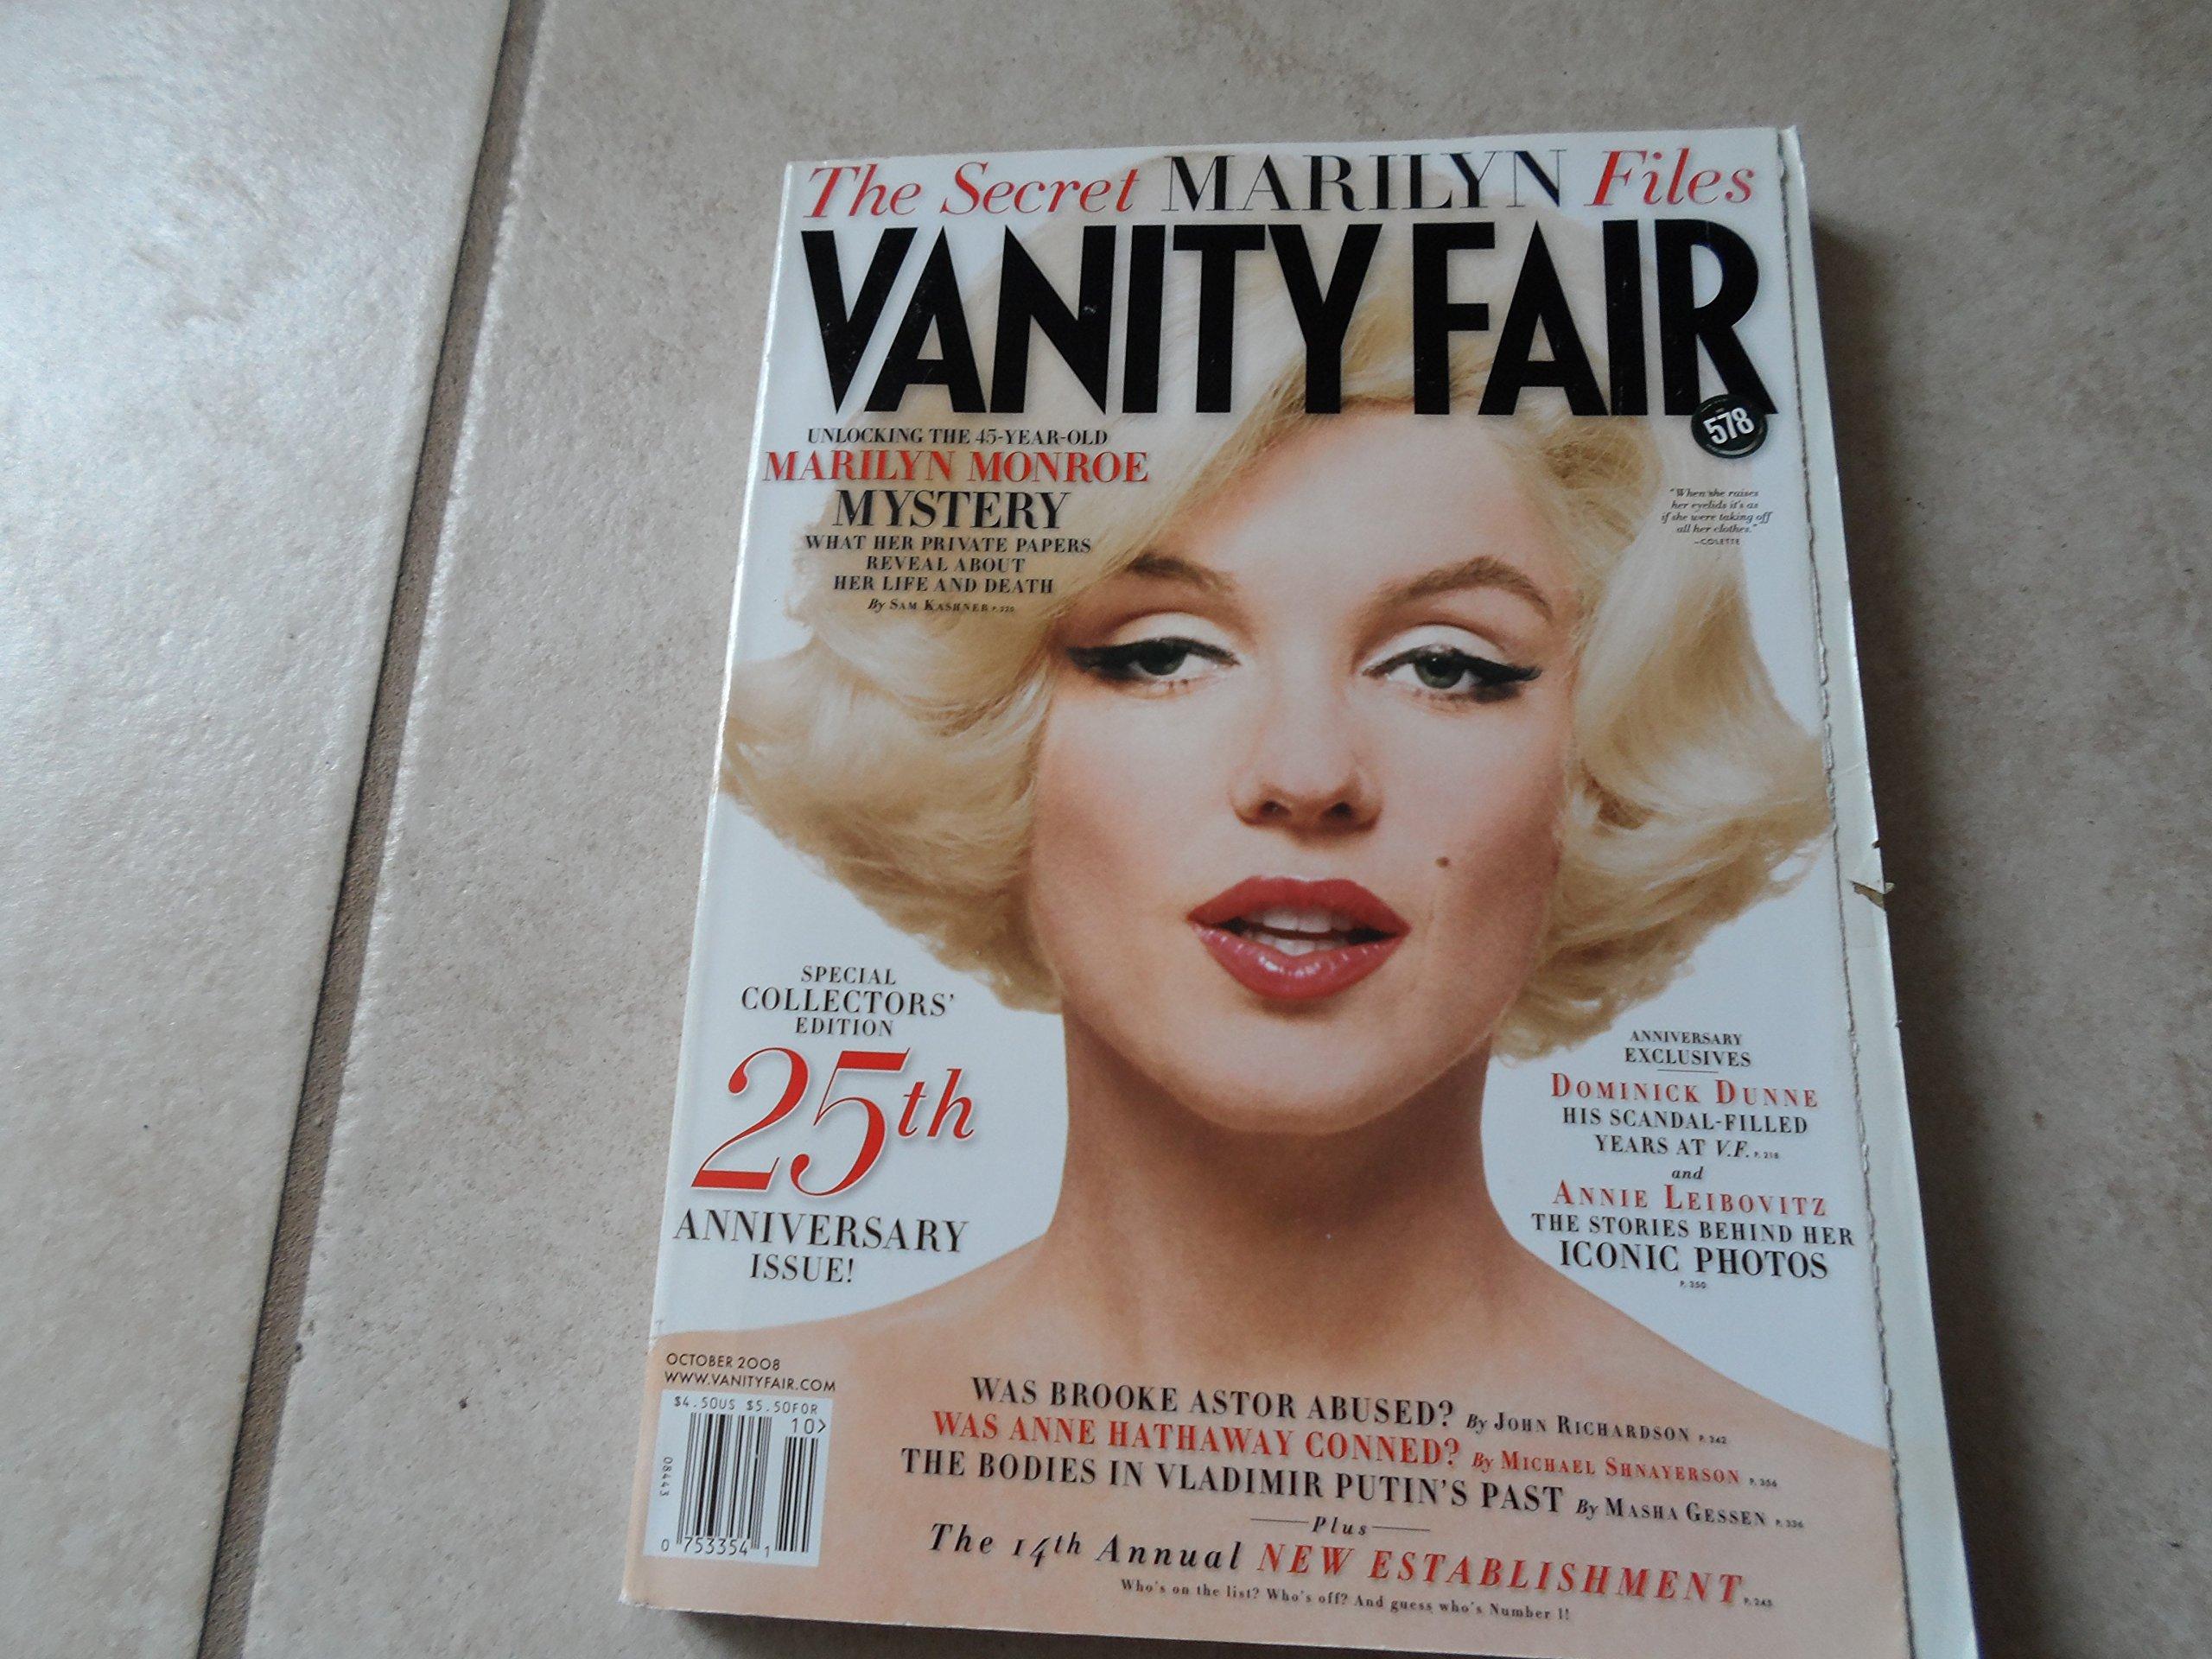 Vanity Fair October 2008 The Secret Marilyn (Monroe) Files (Special Collectors' Edition 25th Anniversary Issue, No. 578) ebook